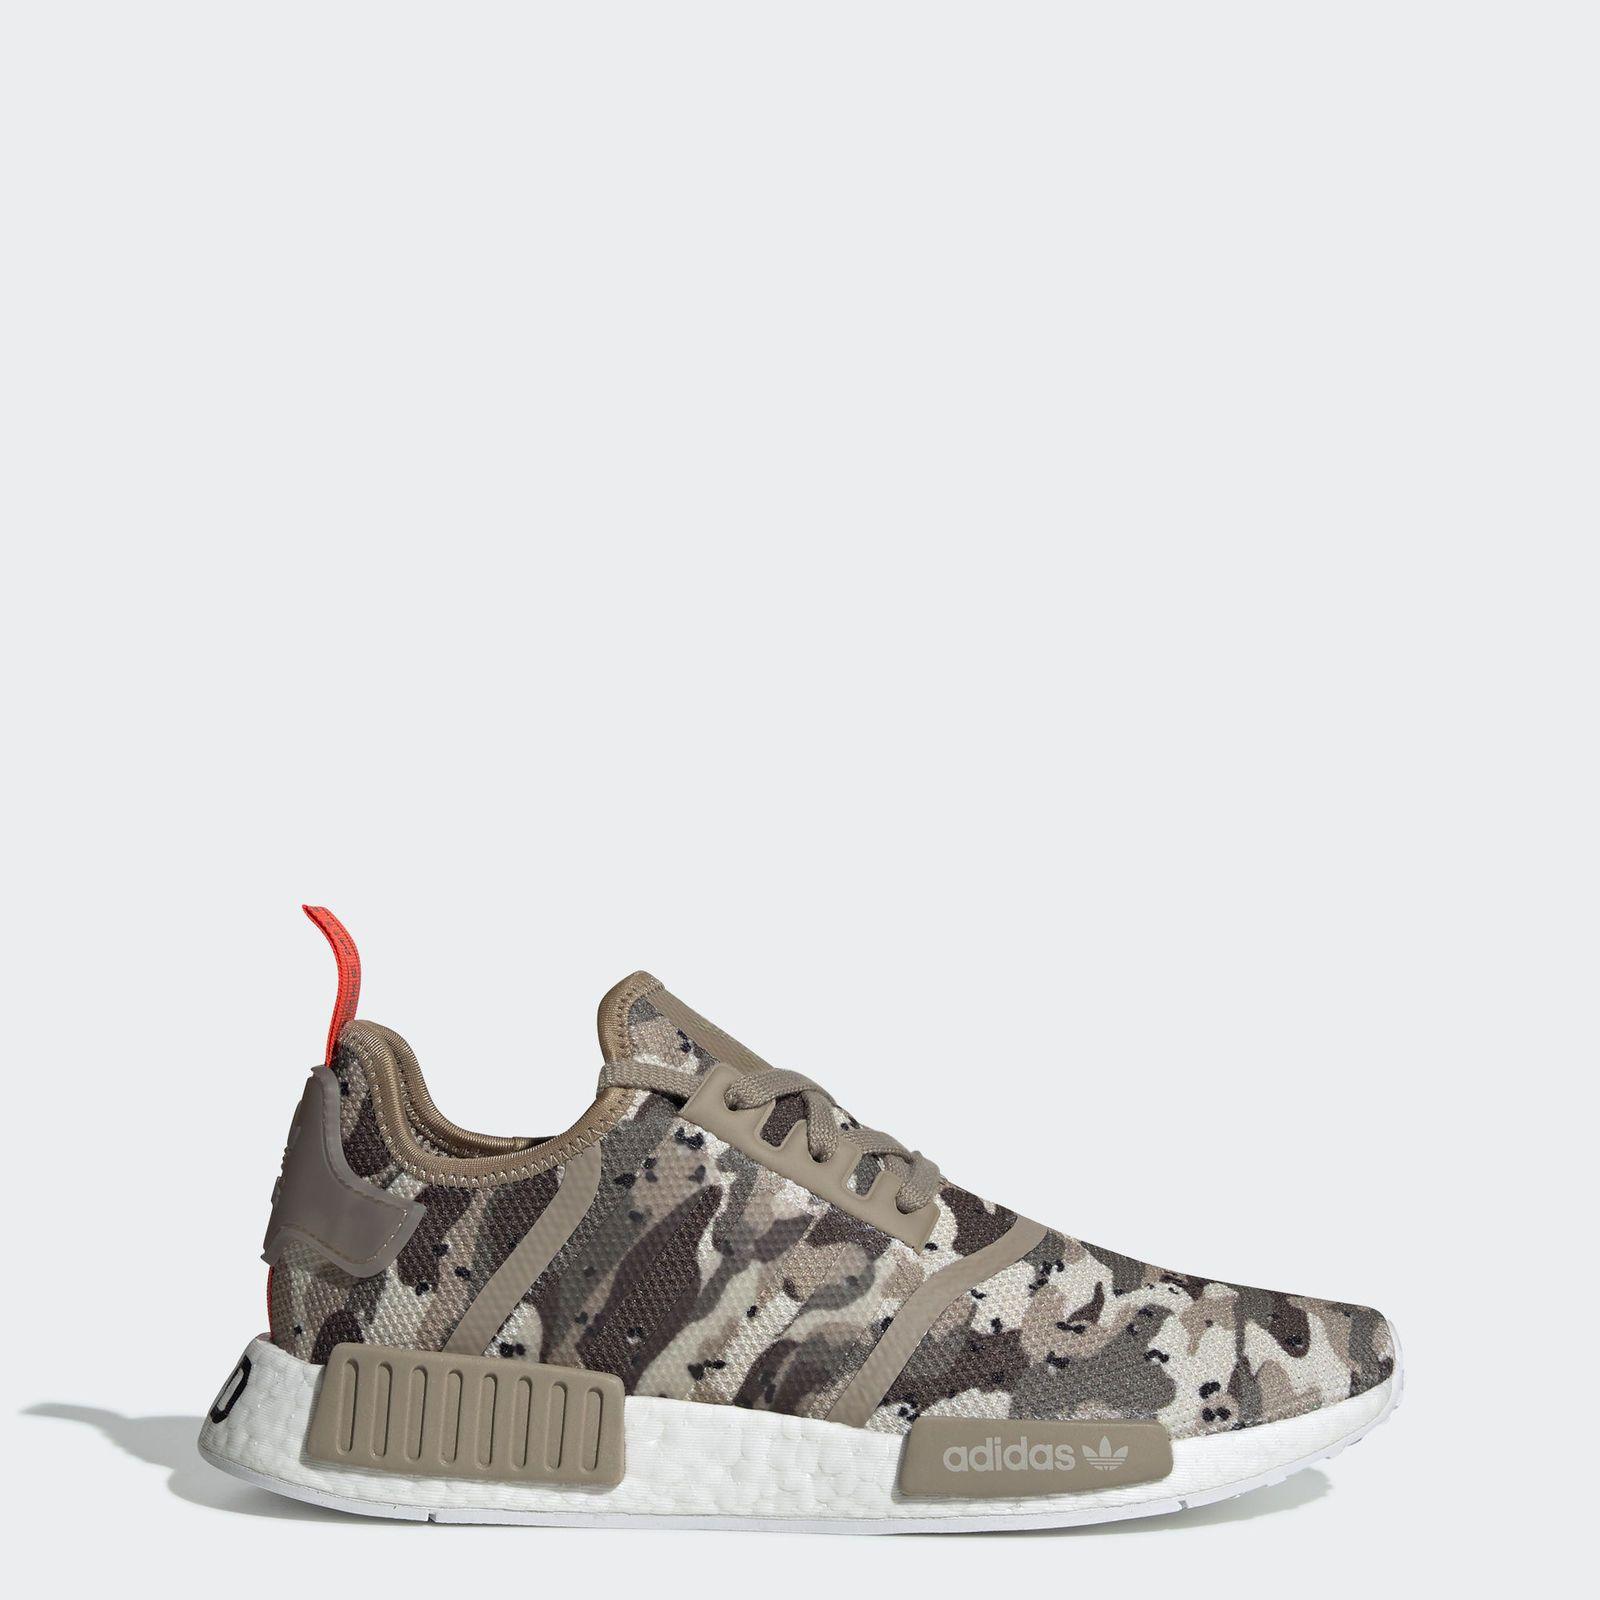 adidas NMD_R1 Shoes Men's   eBay